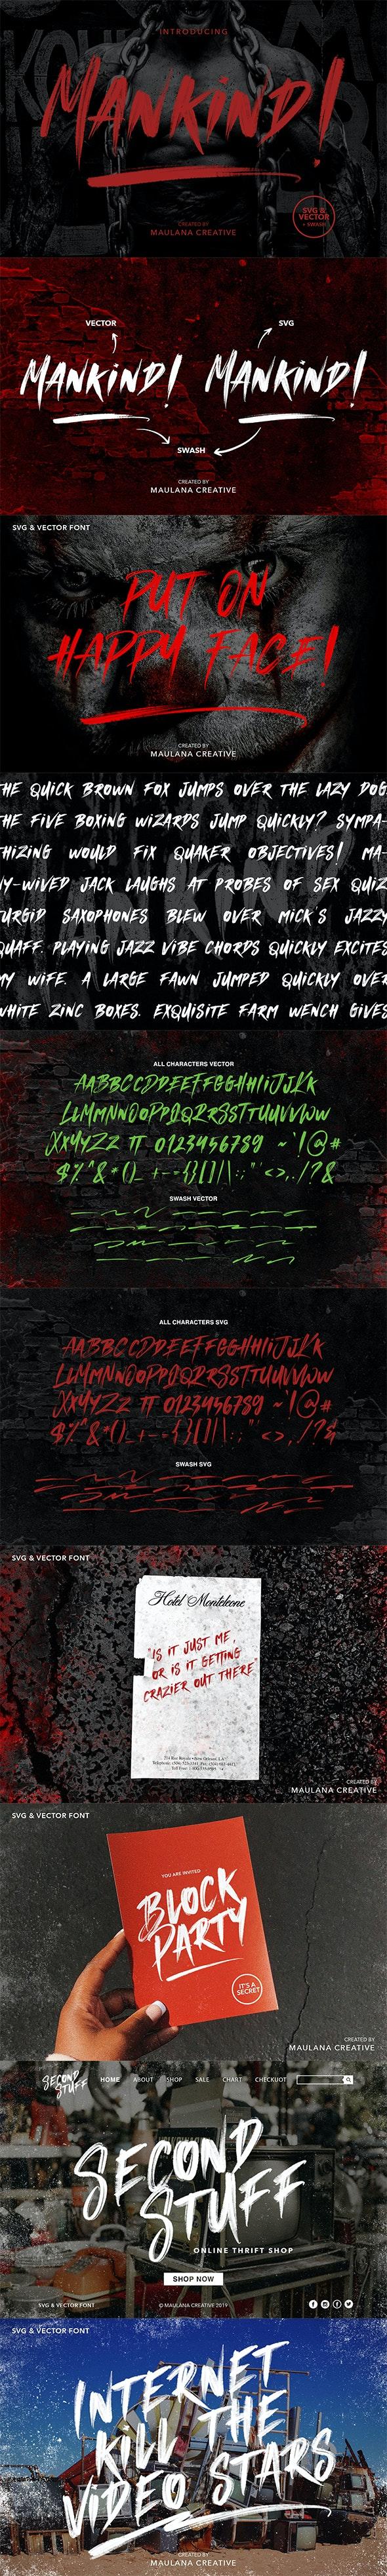 MANKIND - SVG Brush Font - Handwriting Fonts